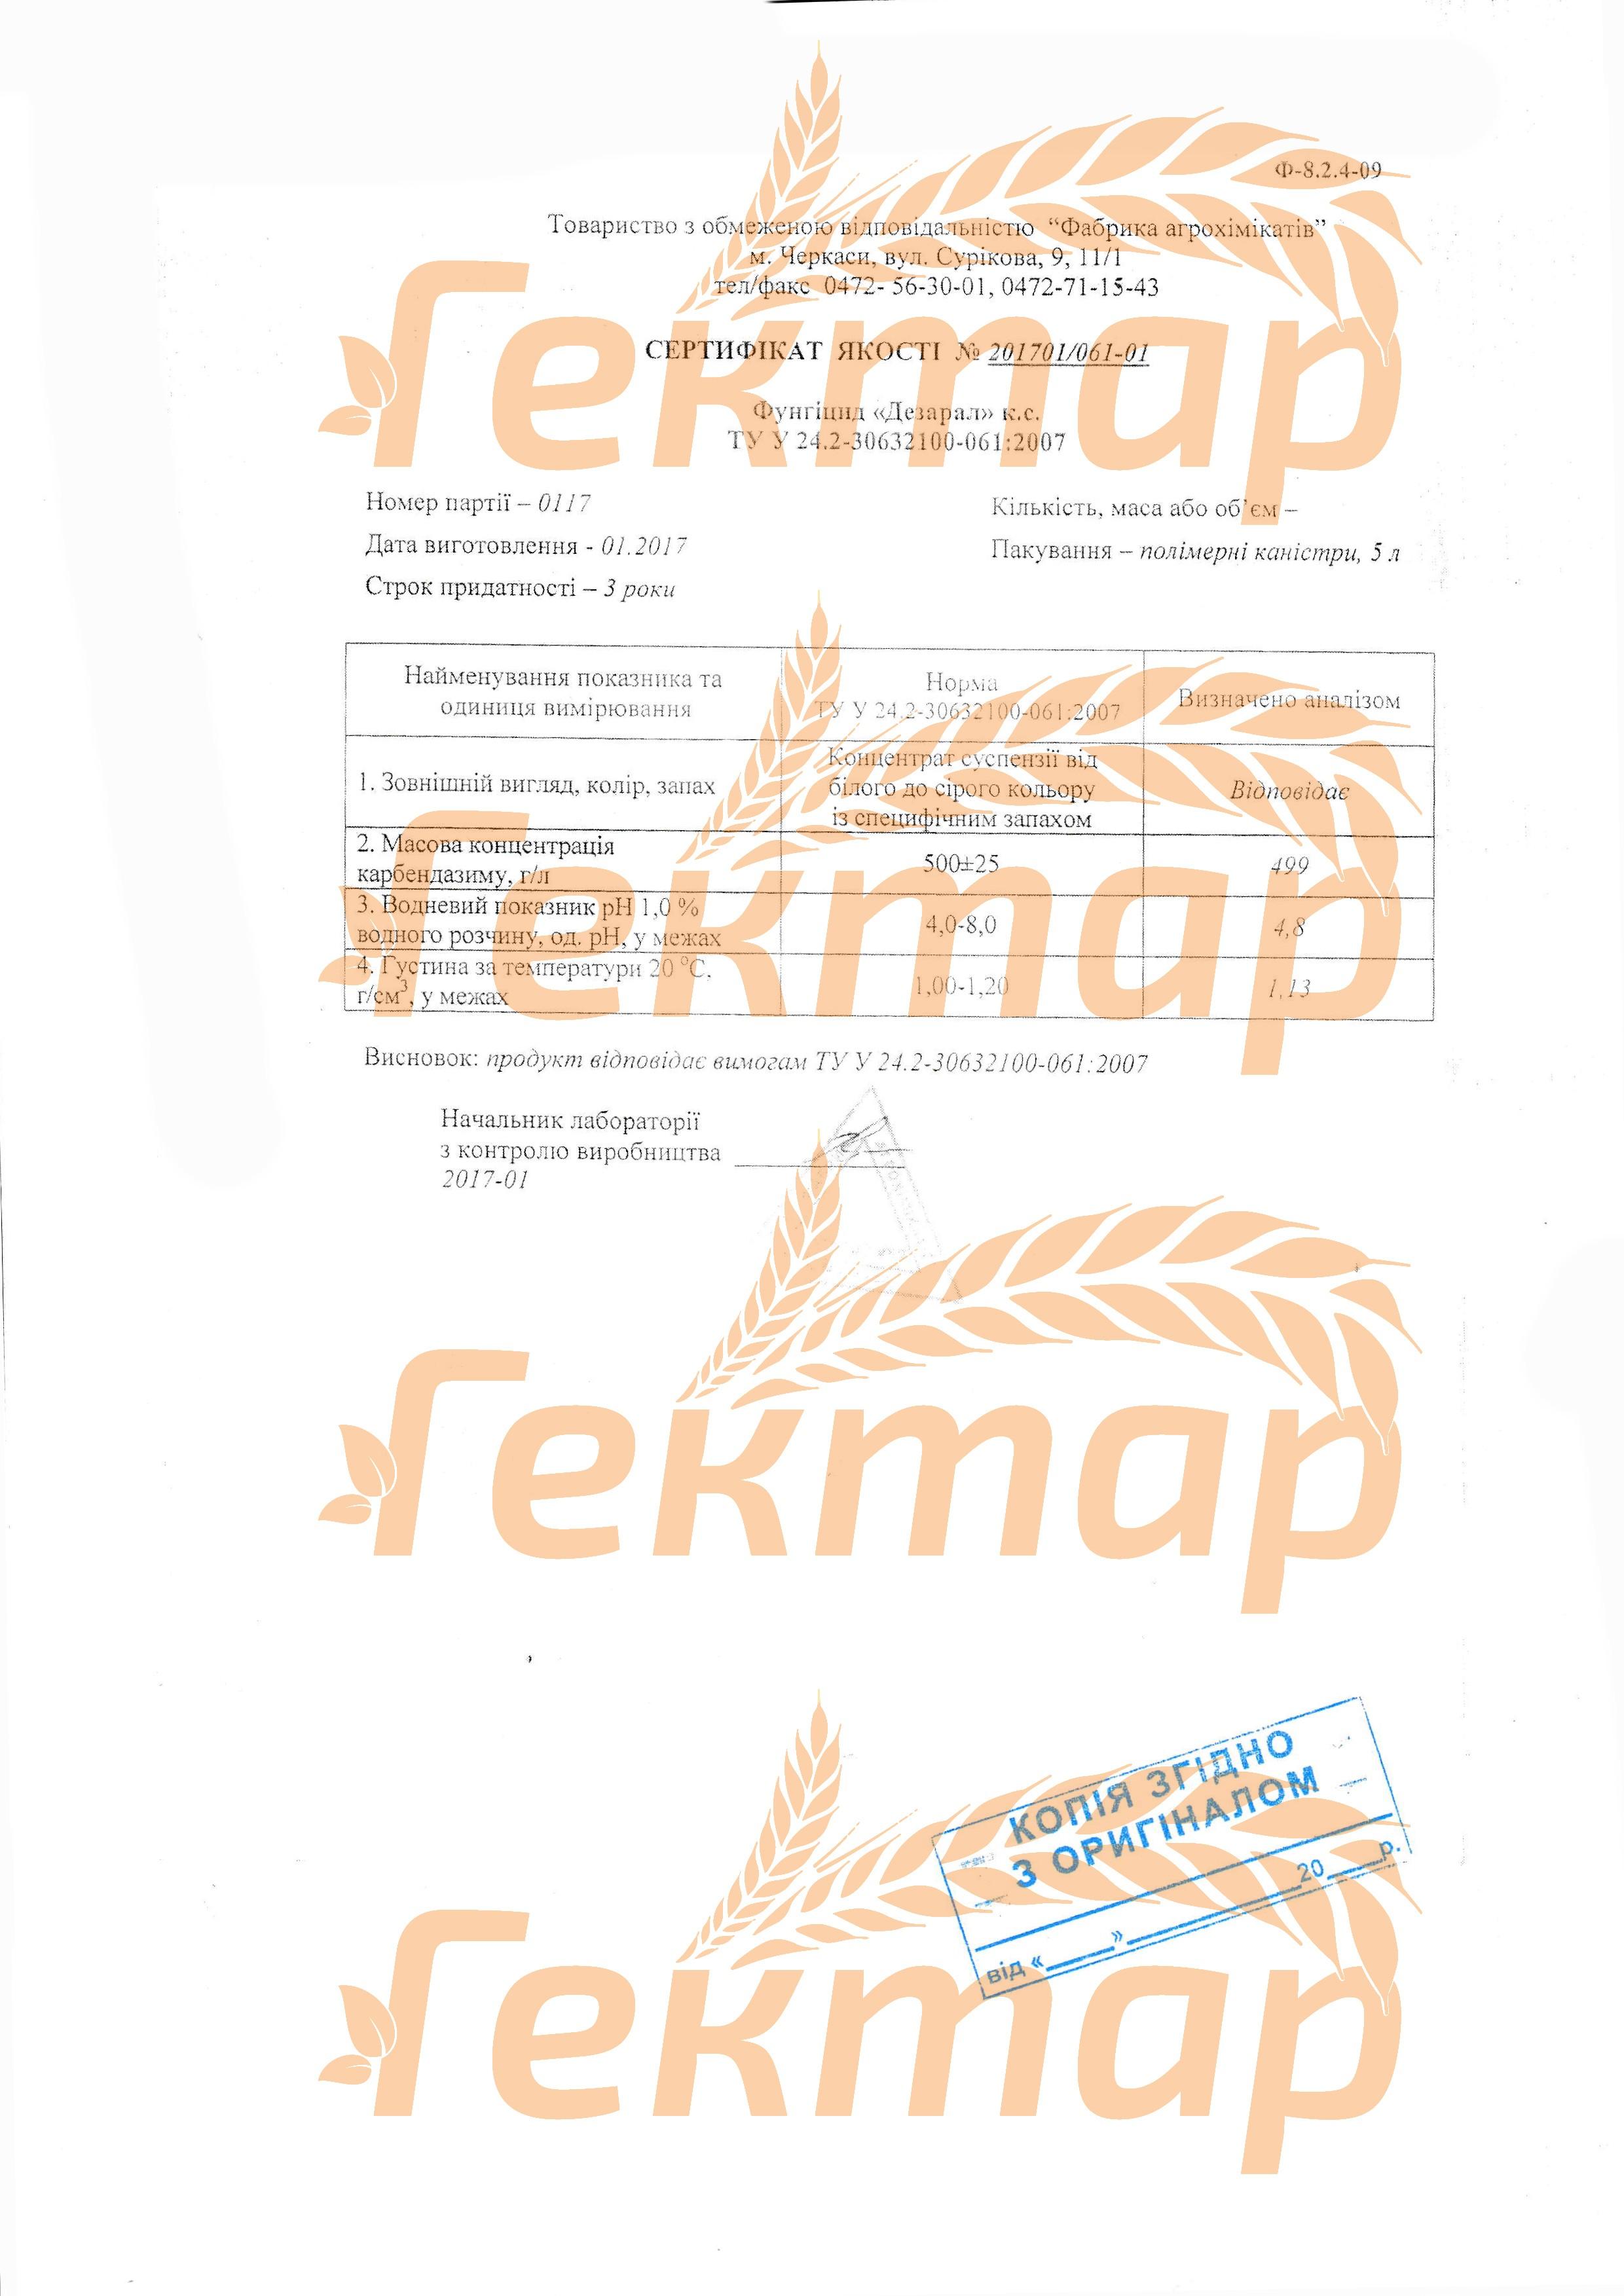 https://hectare.ua/upload/5ab3652c799df.jpg